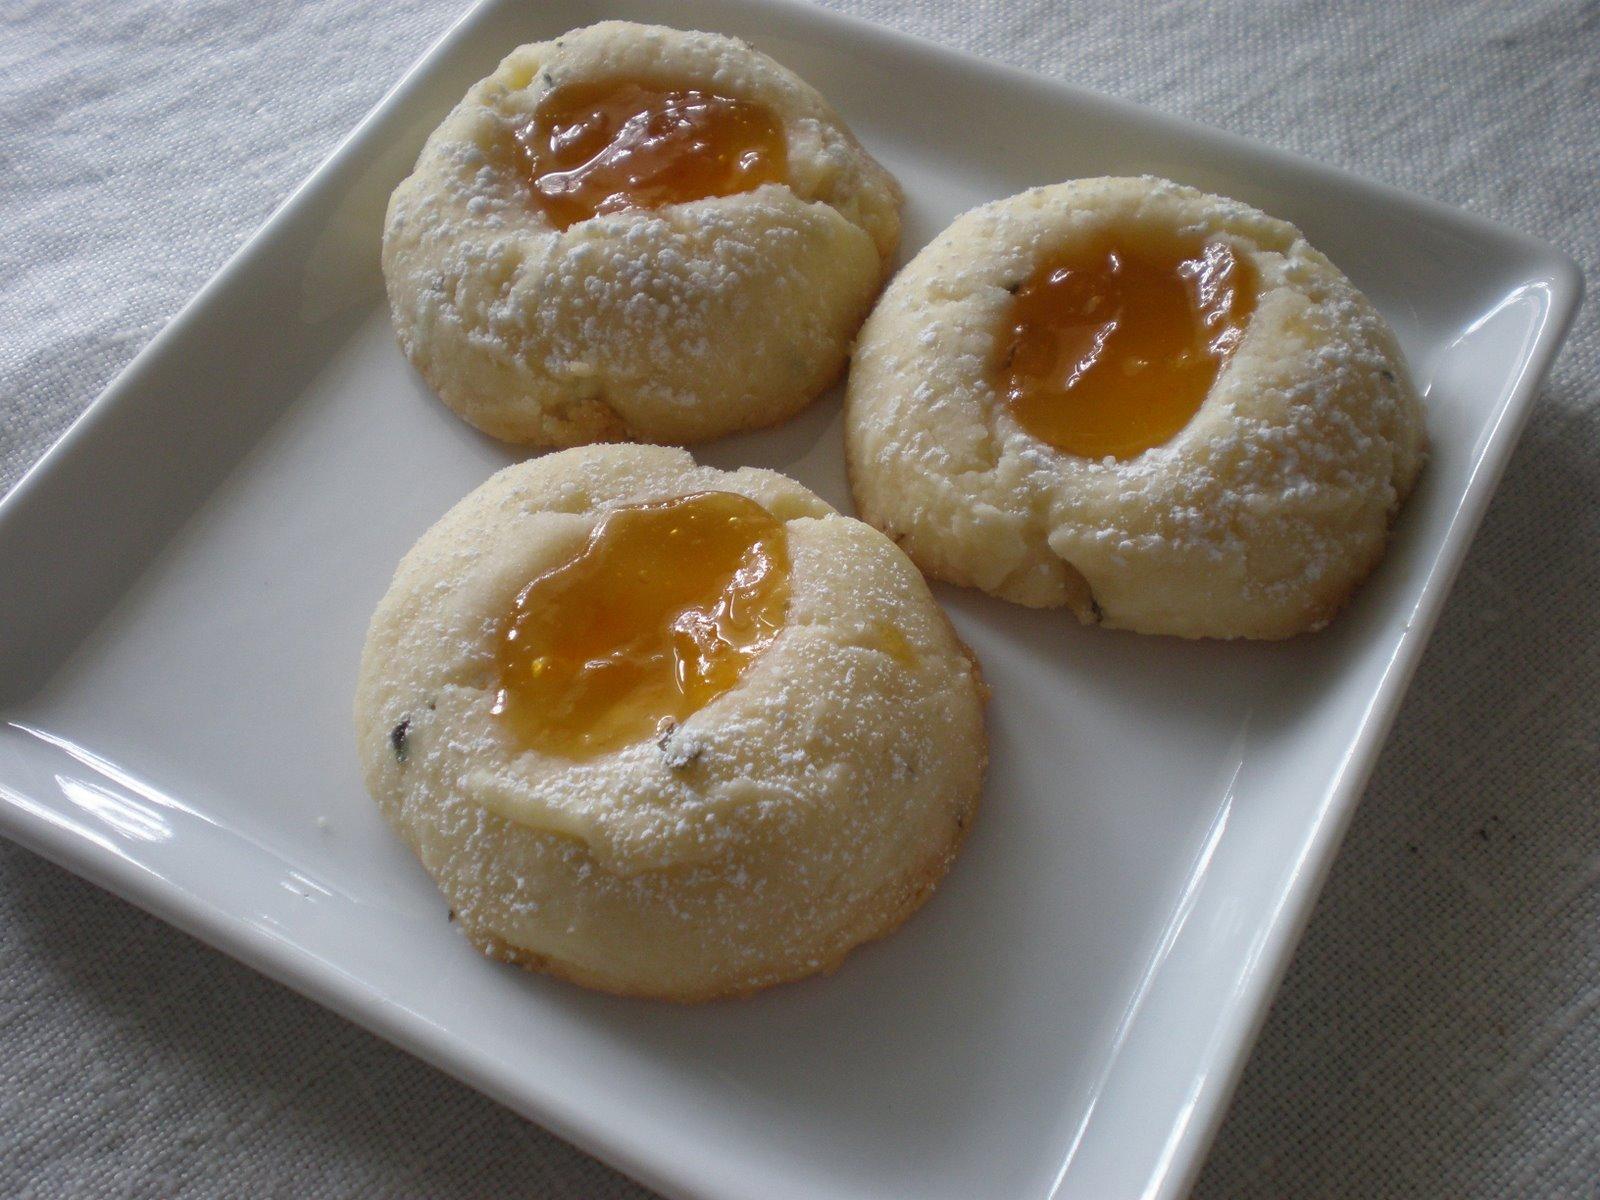 Madison Dinner Club: Rosemary Apricot Thumbprints - April ...